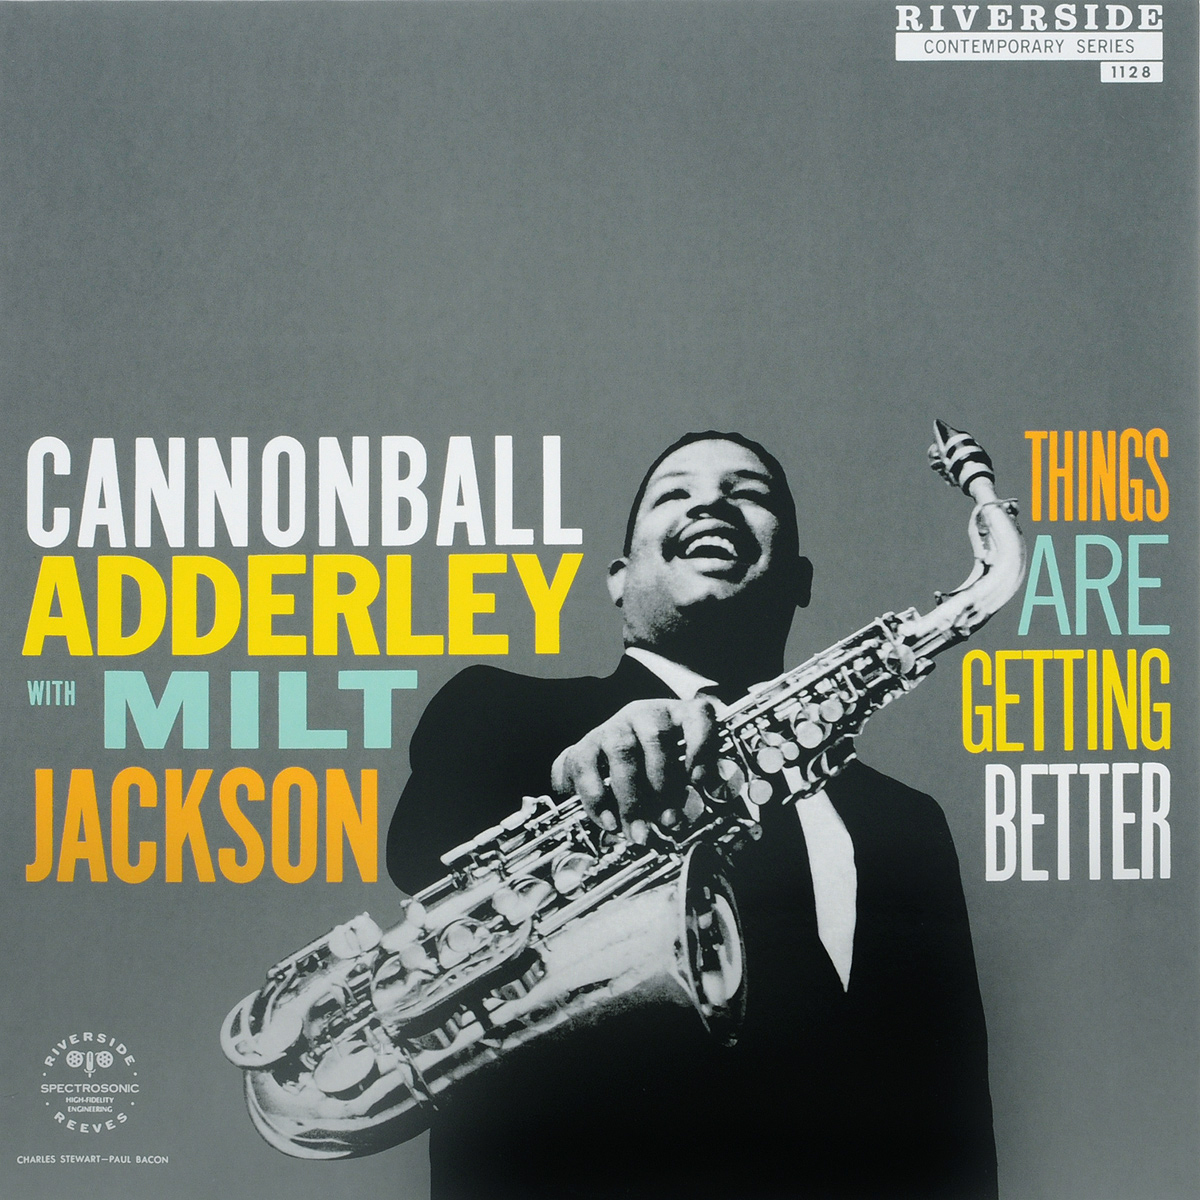 Кэннонболл Эдерли,Милт Джексон Cannonball Adderley With Milt Jackson. Things Are Getting Better (LP) кэннонболл эдерли милт джексон cannonball adderley with milt jackson things are getting better lp